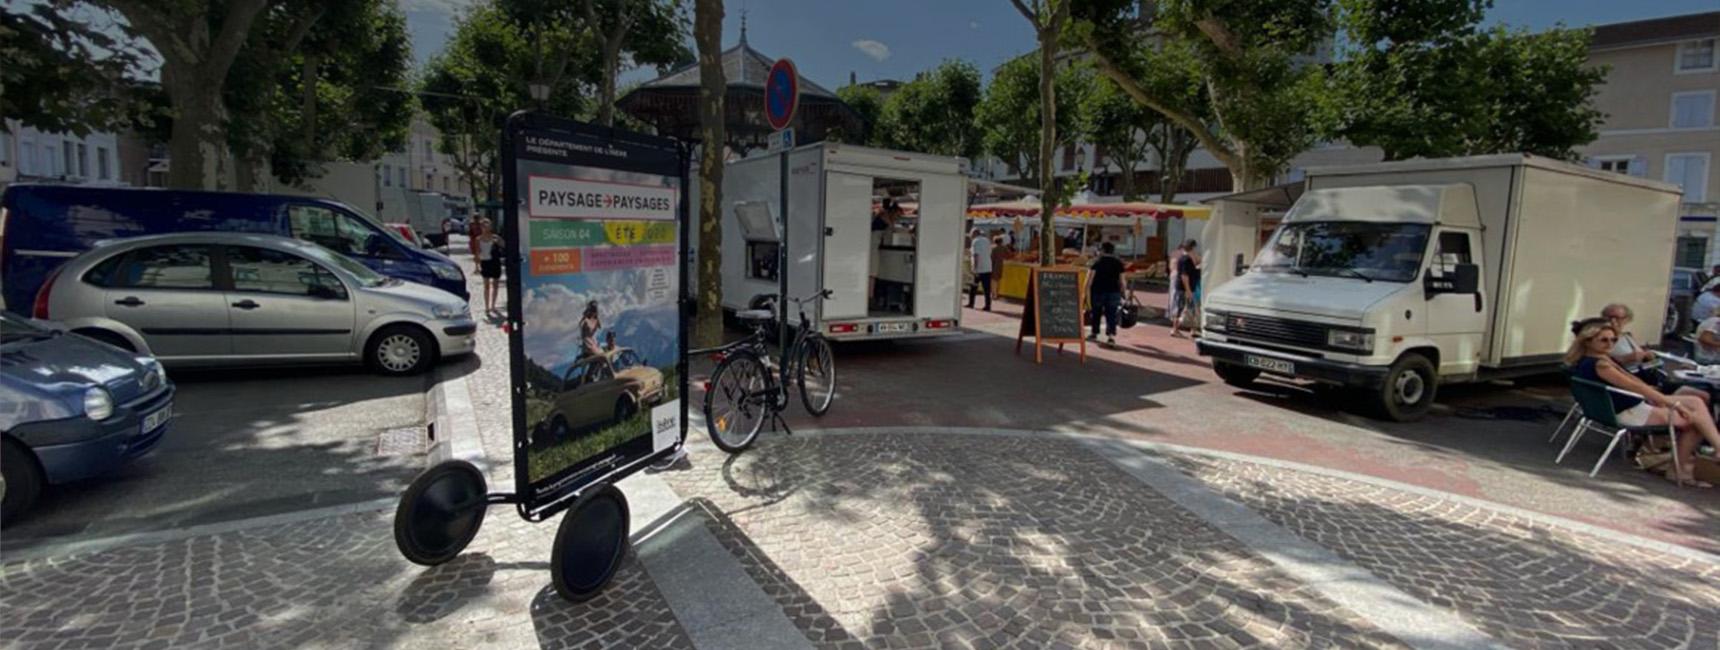 affichage mobile bike com departement isere keemia lyon agence marketing locale en region rhone alpes